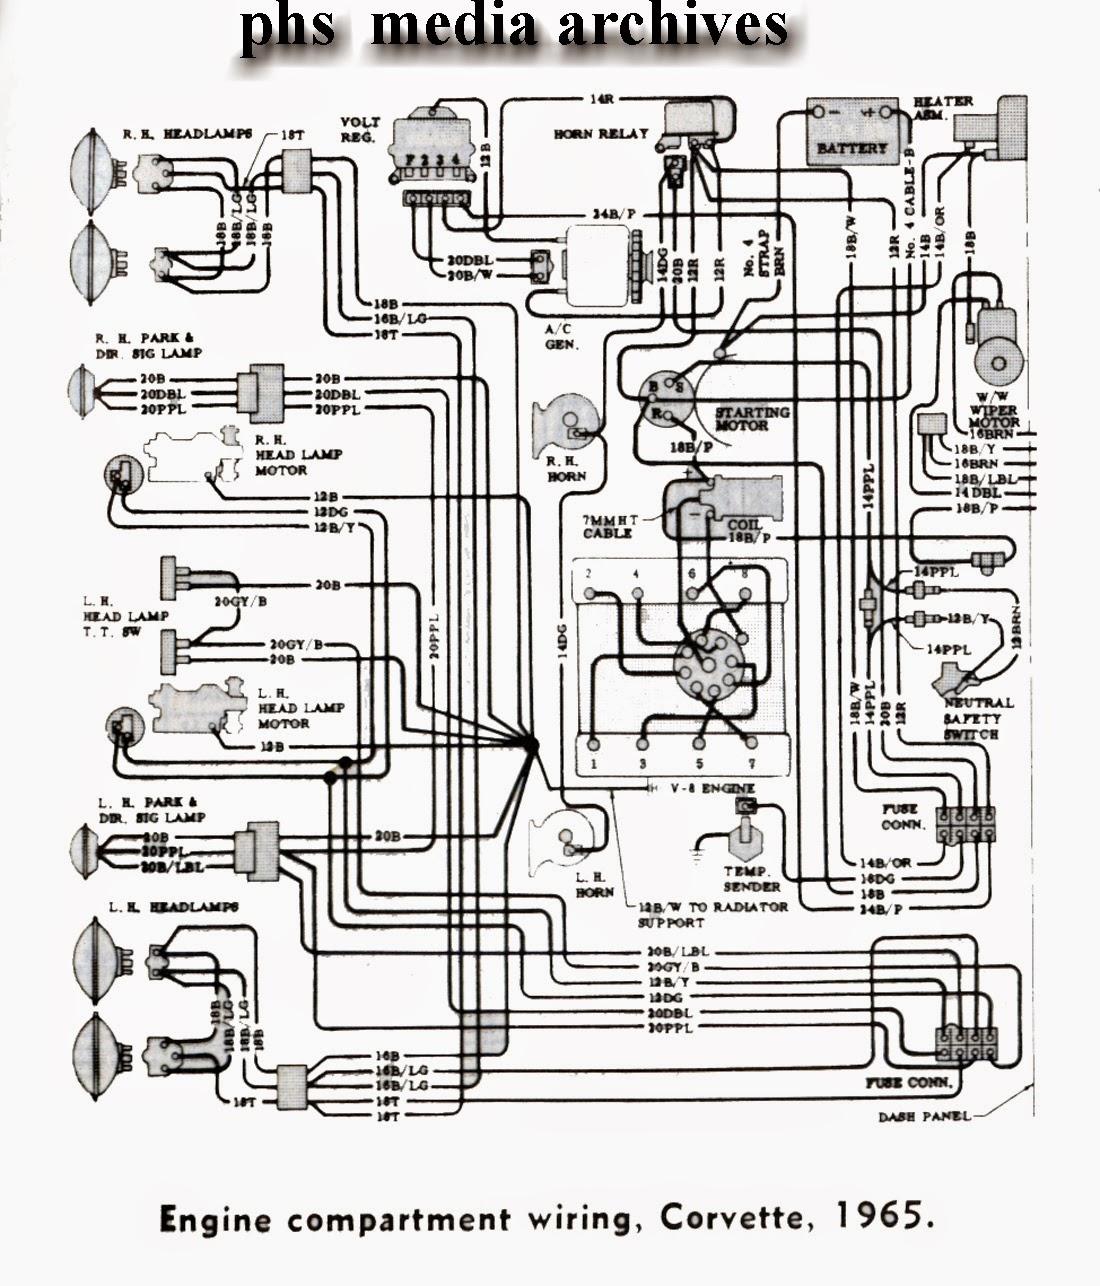 1979 Chevy Camaro Wiring Diagram 1981 Engine Harness 81 Detailed Diagrams Rh Standrewsthorntonheath Co Uk 79